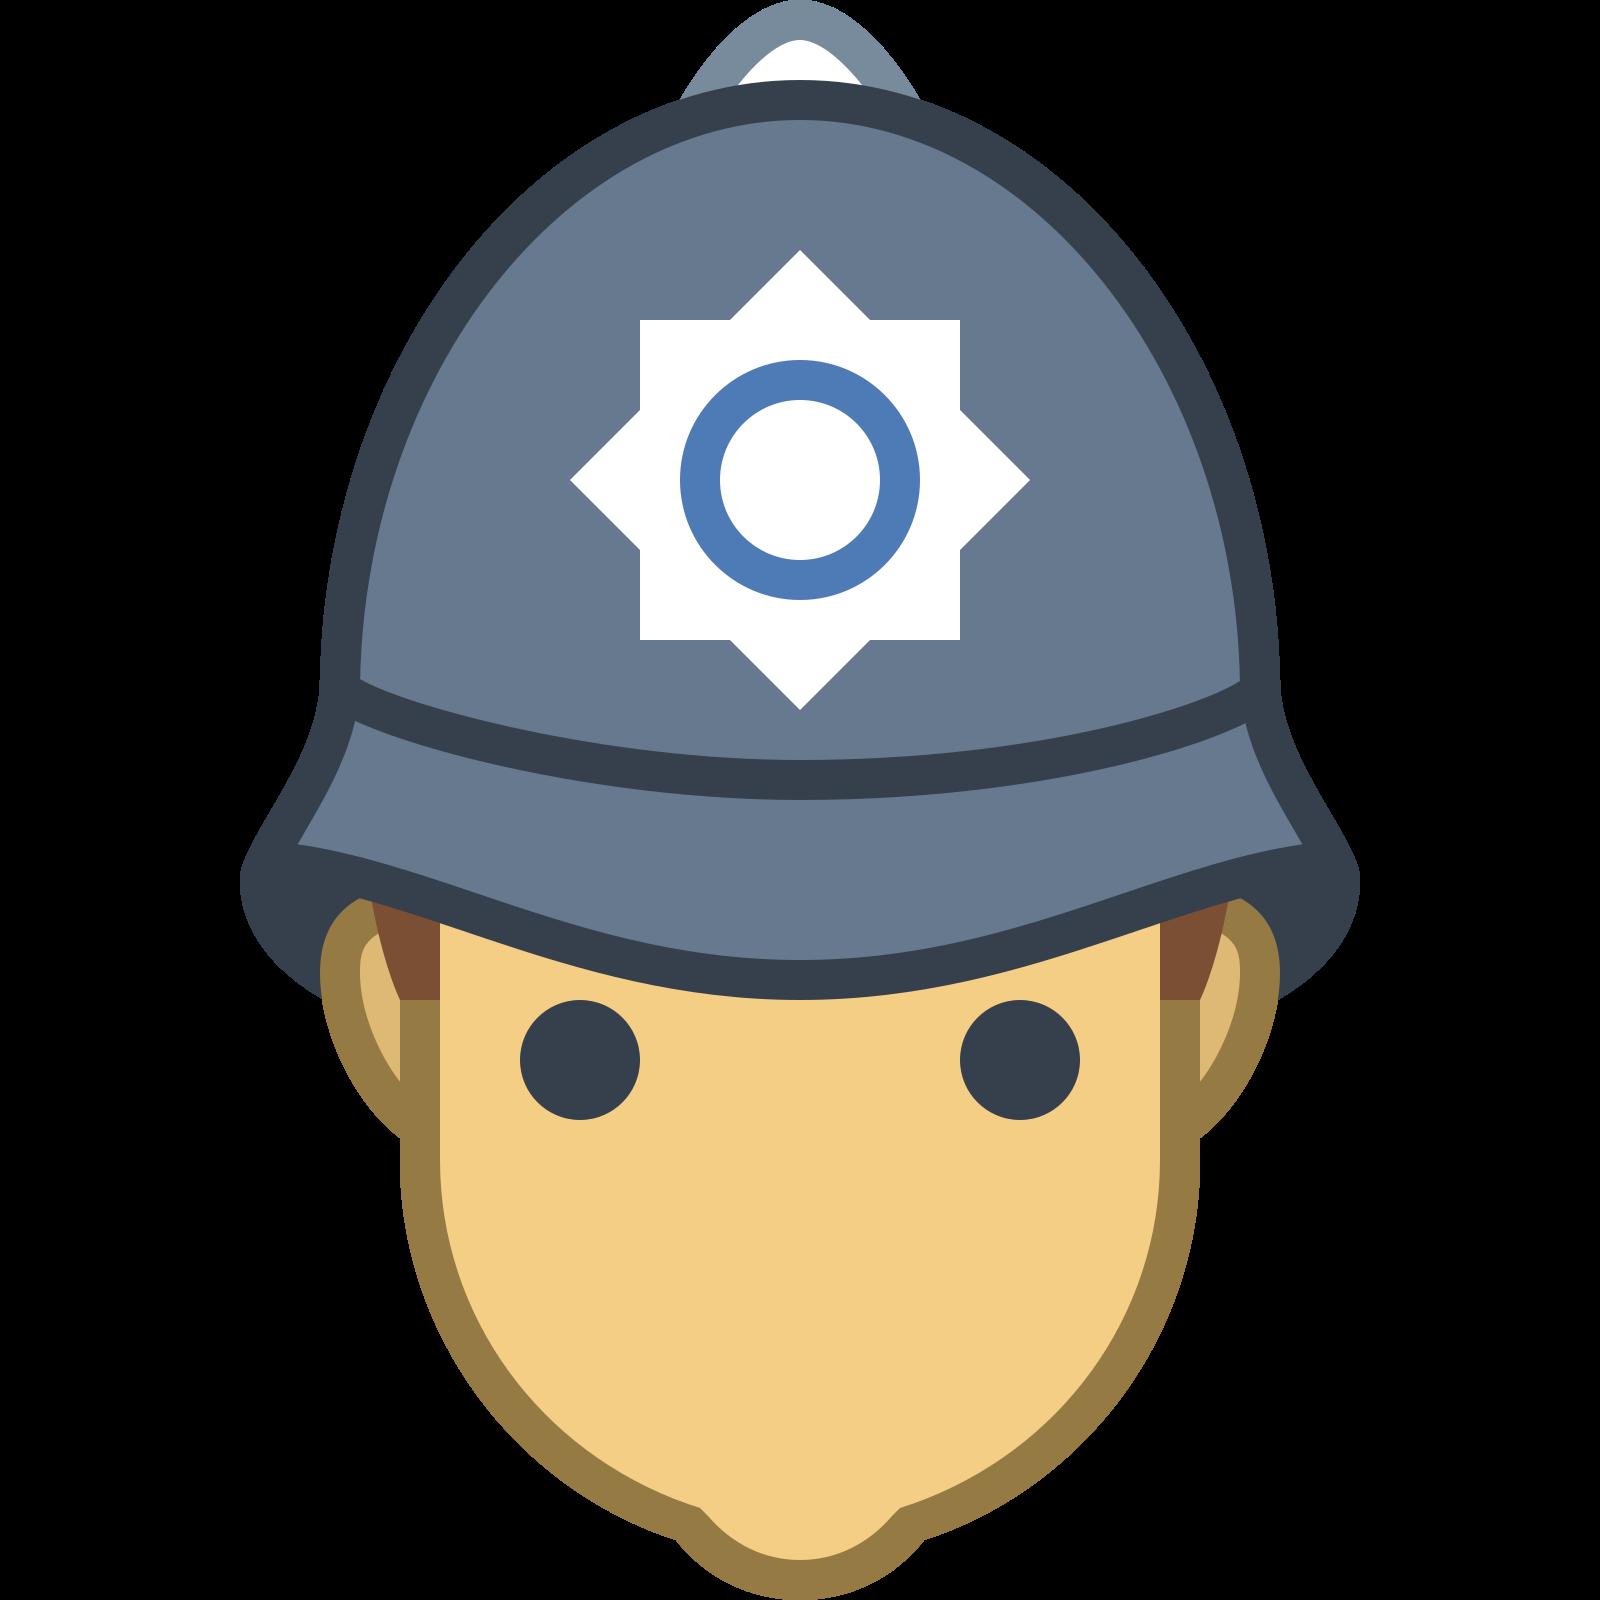 British Police Officer icon